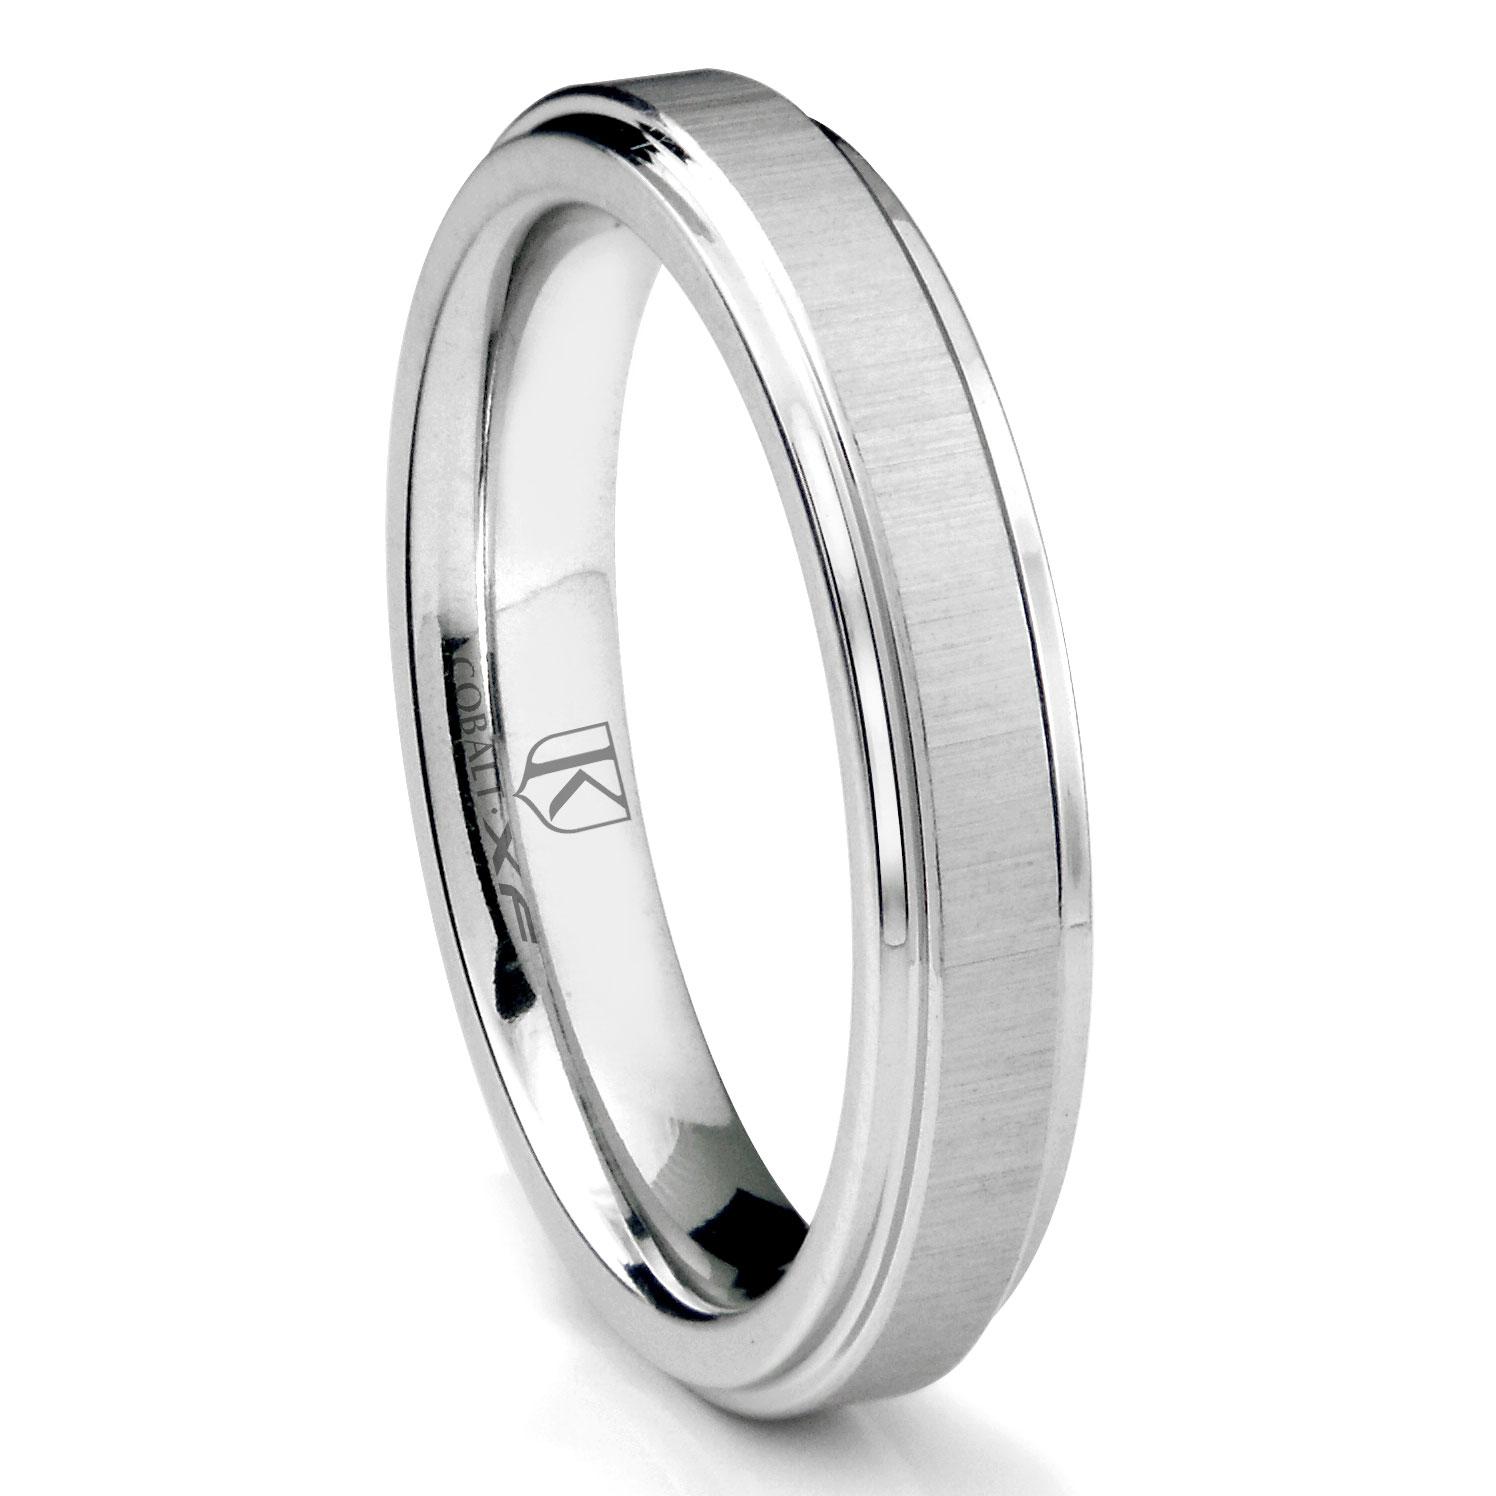 Cobalt XF Chrome 4MM Satin Finish Wedding Band Ring w Raised Center